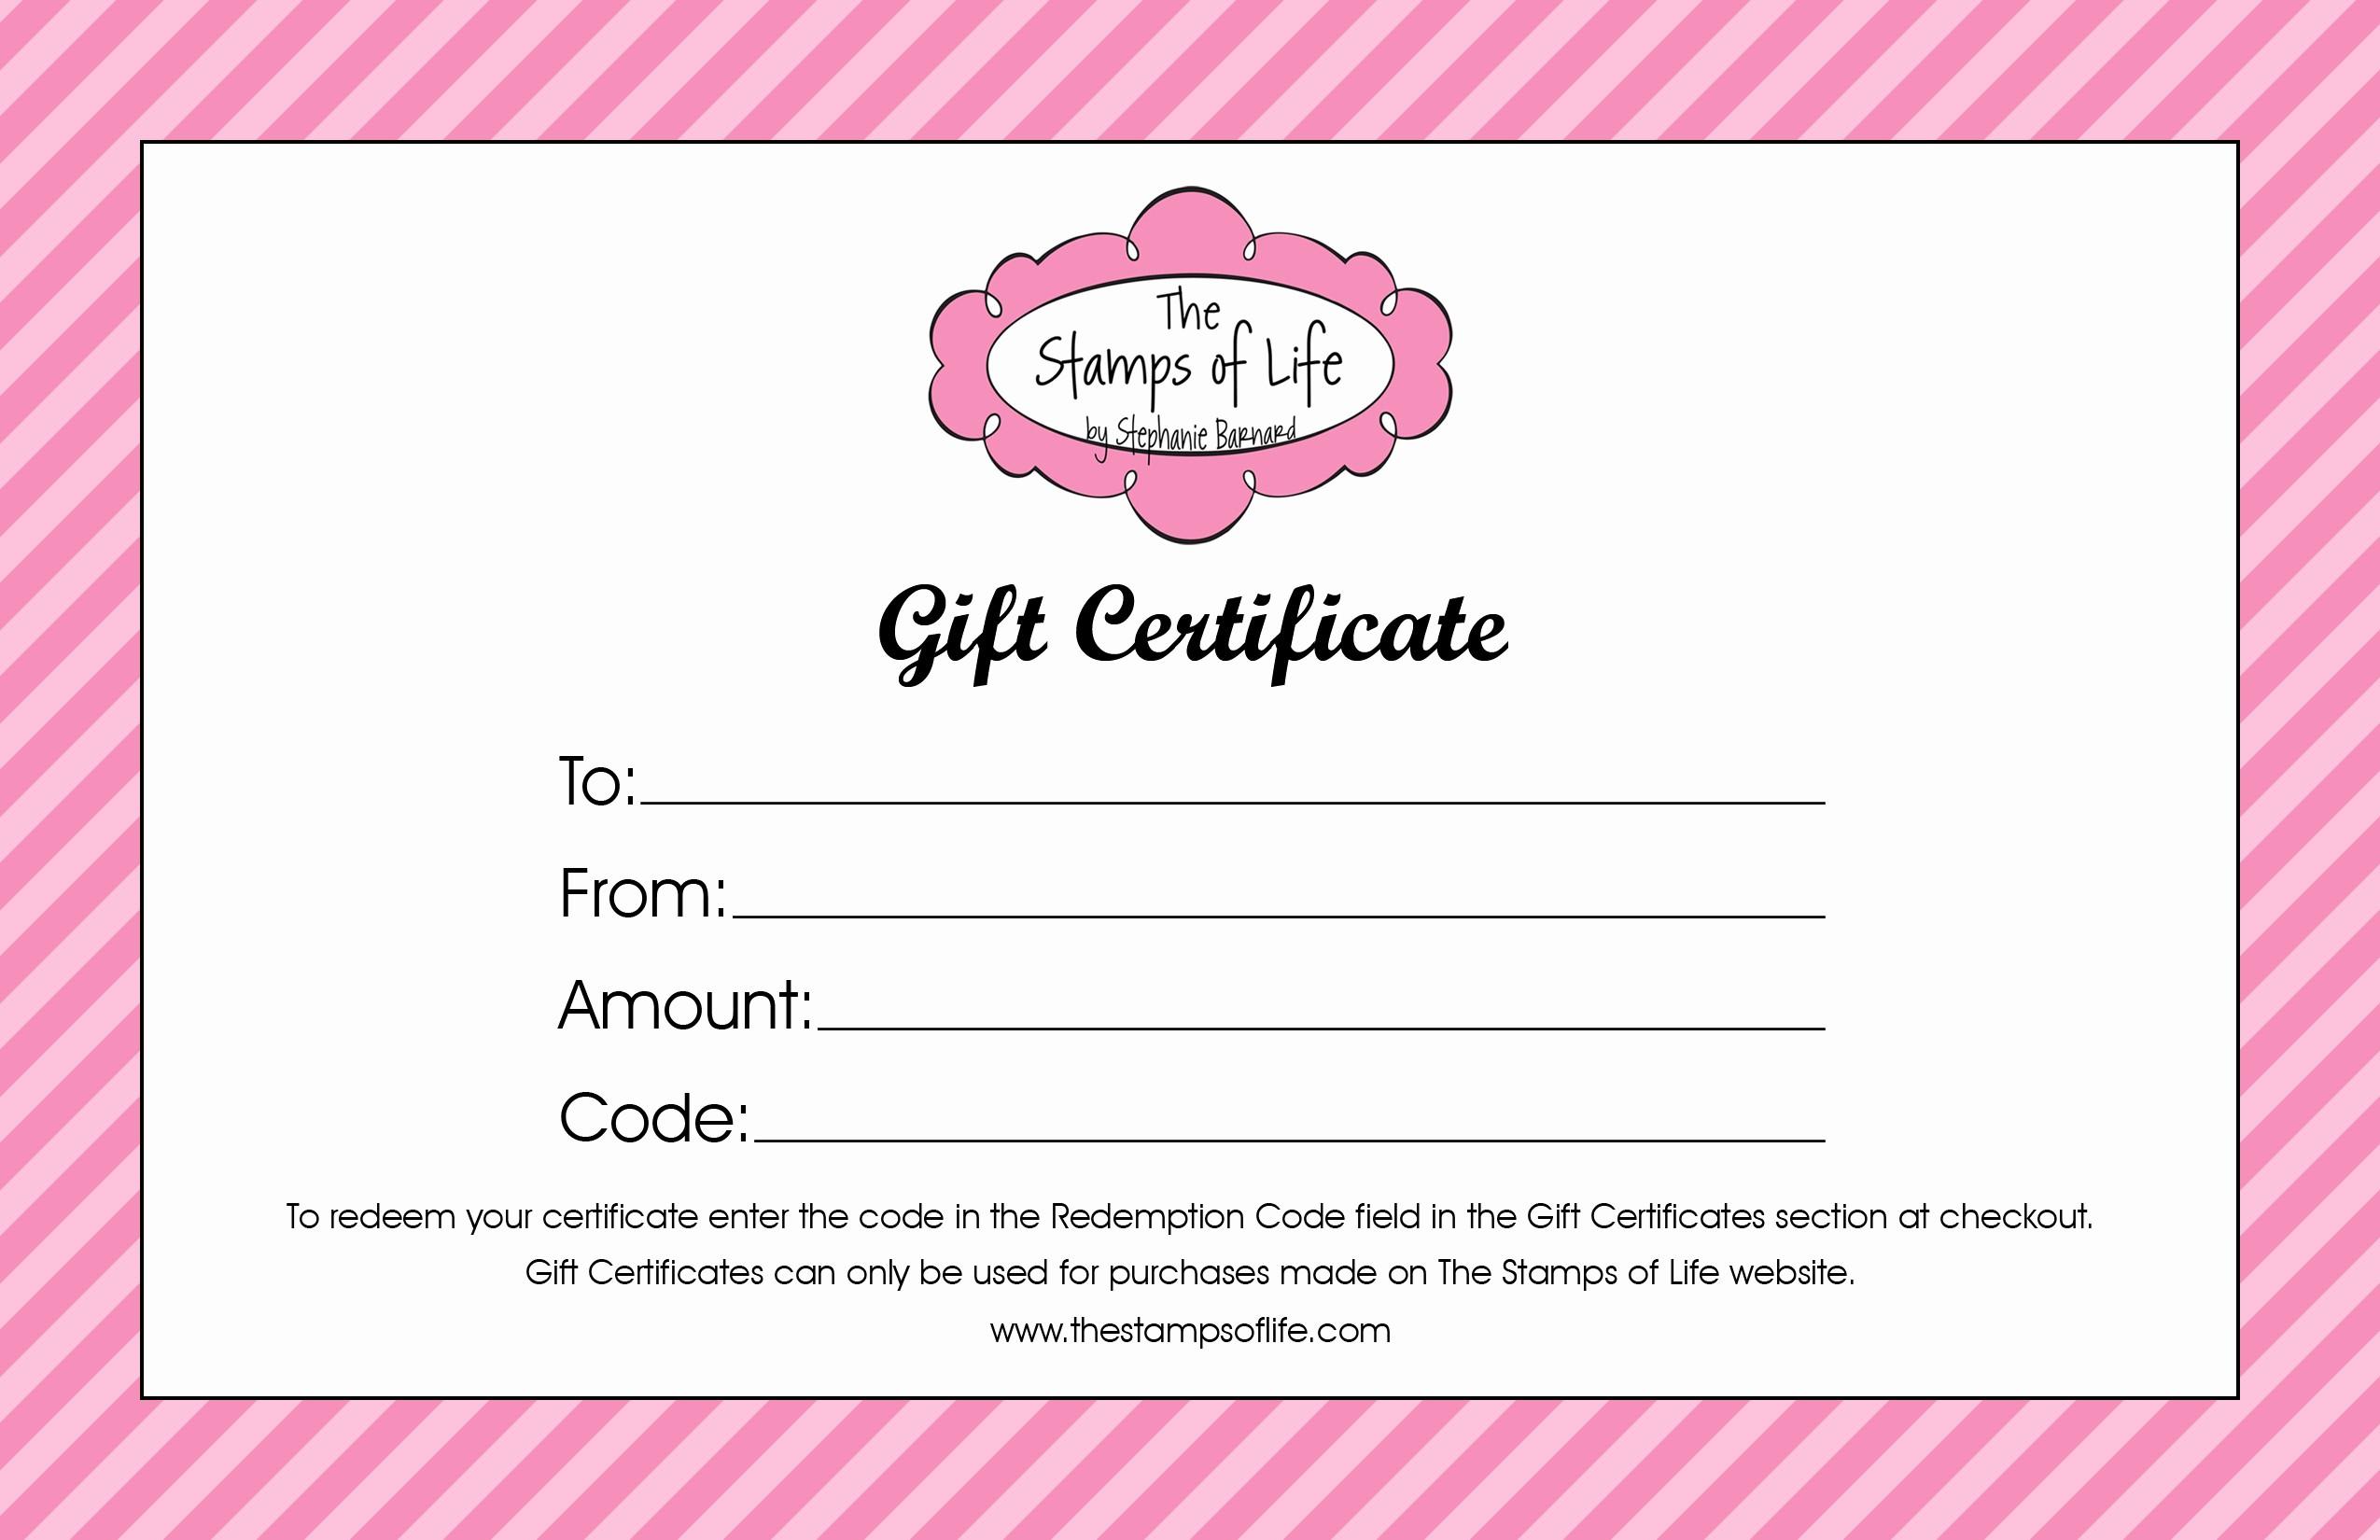 Generic Gift Certificate Template Free Fresh 21 Free Free Gift Certificate Templates Word Excel formats